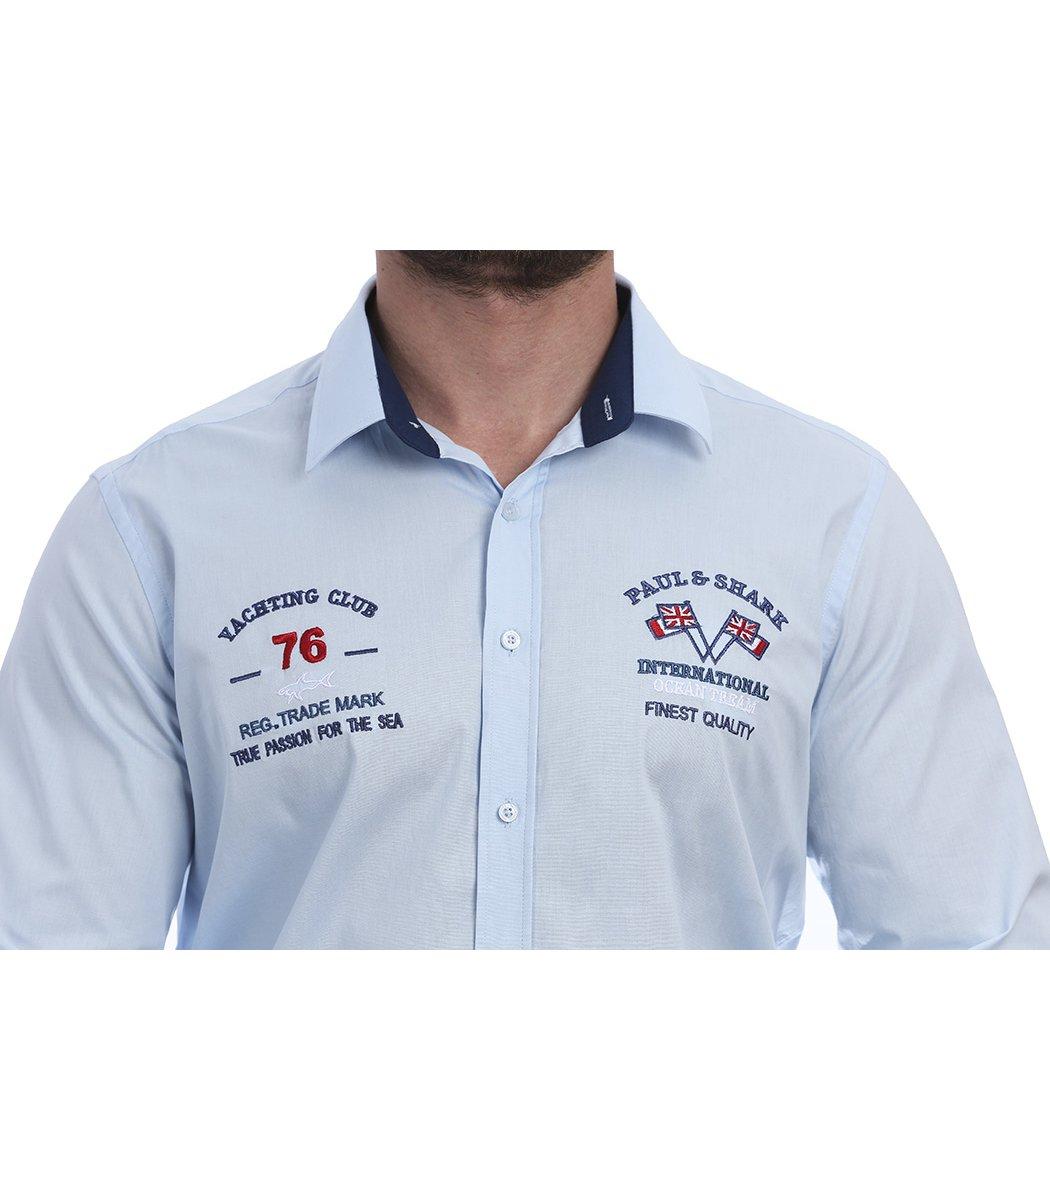 Голубая рубашка Paul&Shark 76 RP1 - Голубой - Вид 4